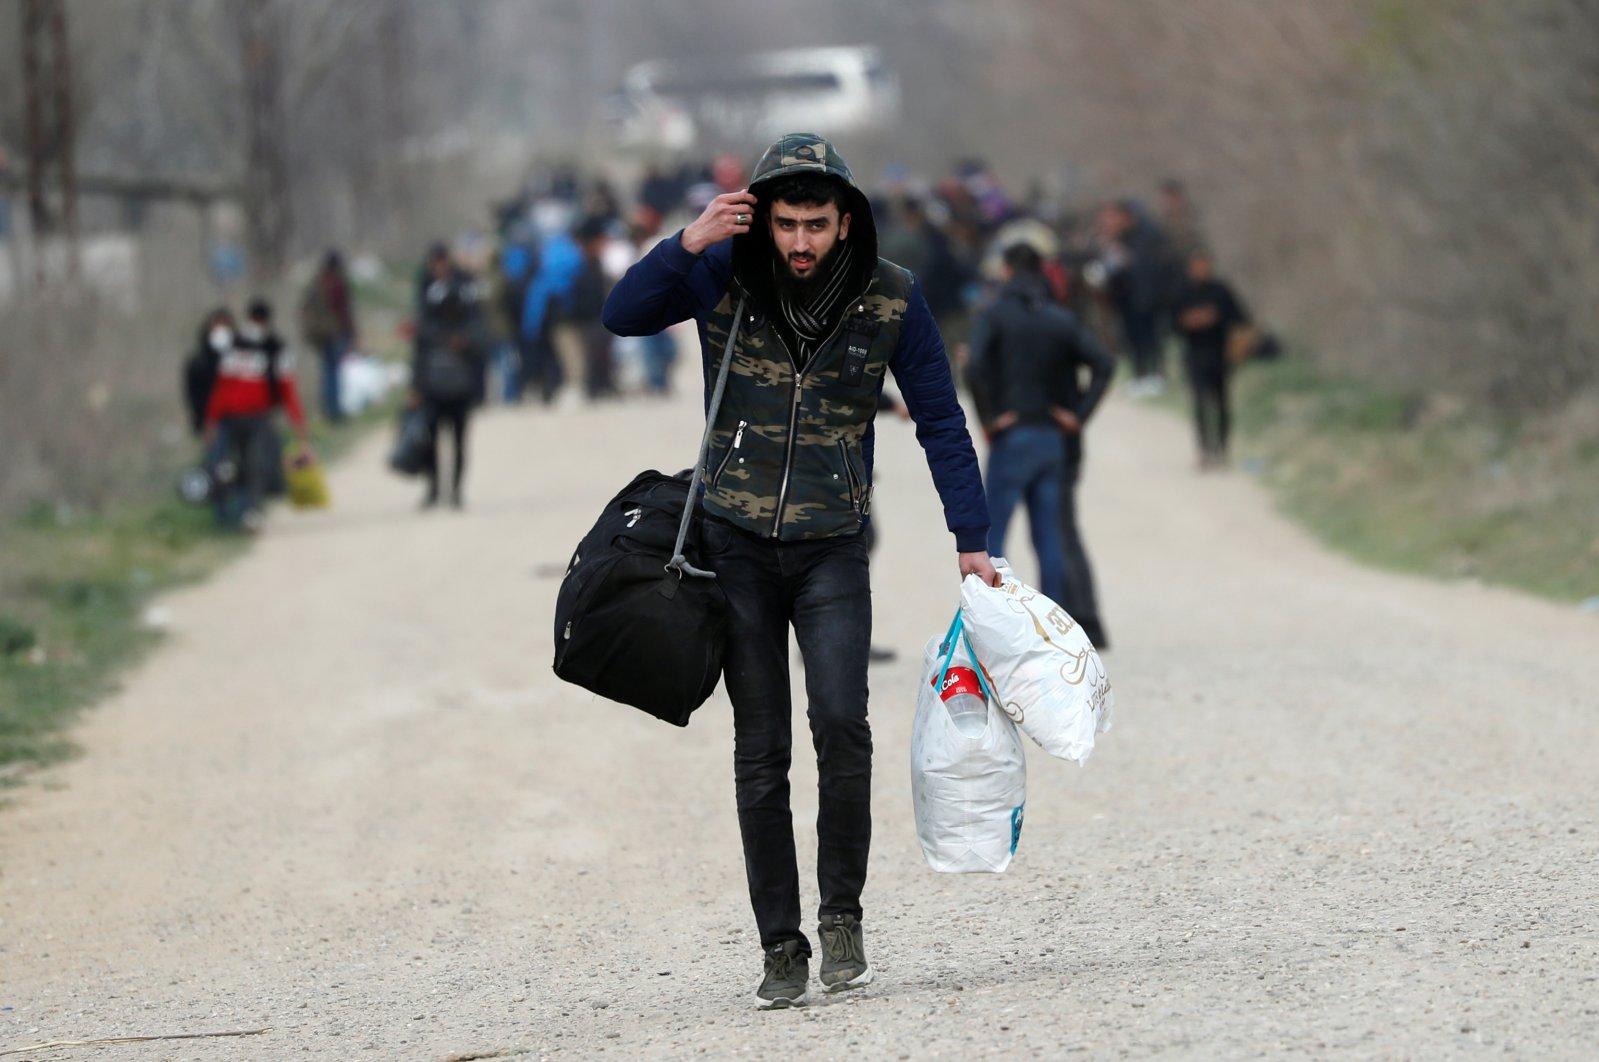 A migrant walks near Turkey's Pazarkule border crossing with Greece's Kastanies, in Edirne, March 10, 2020. REUTERS